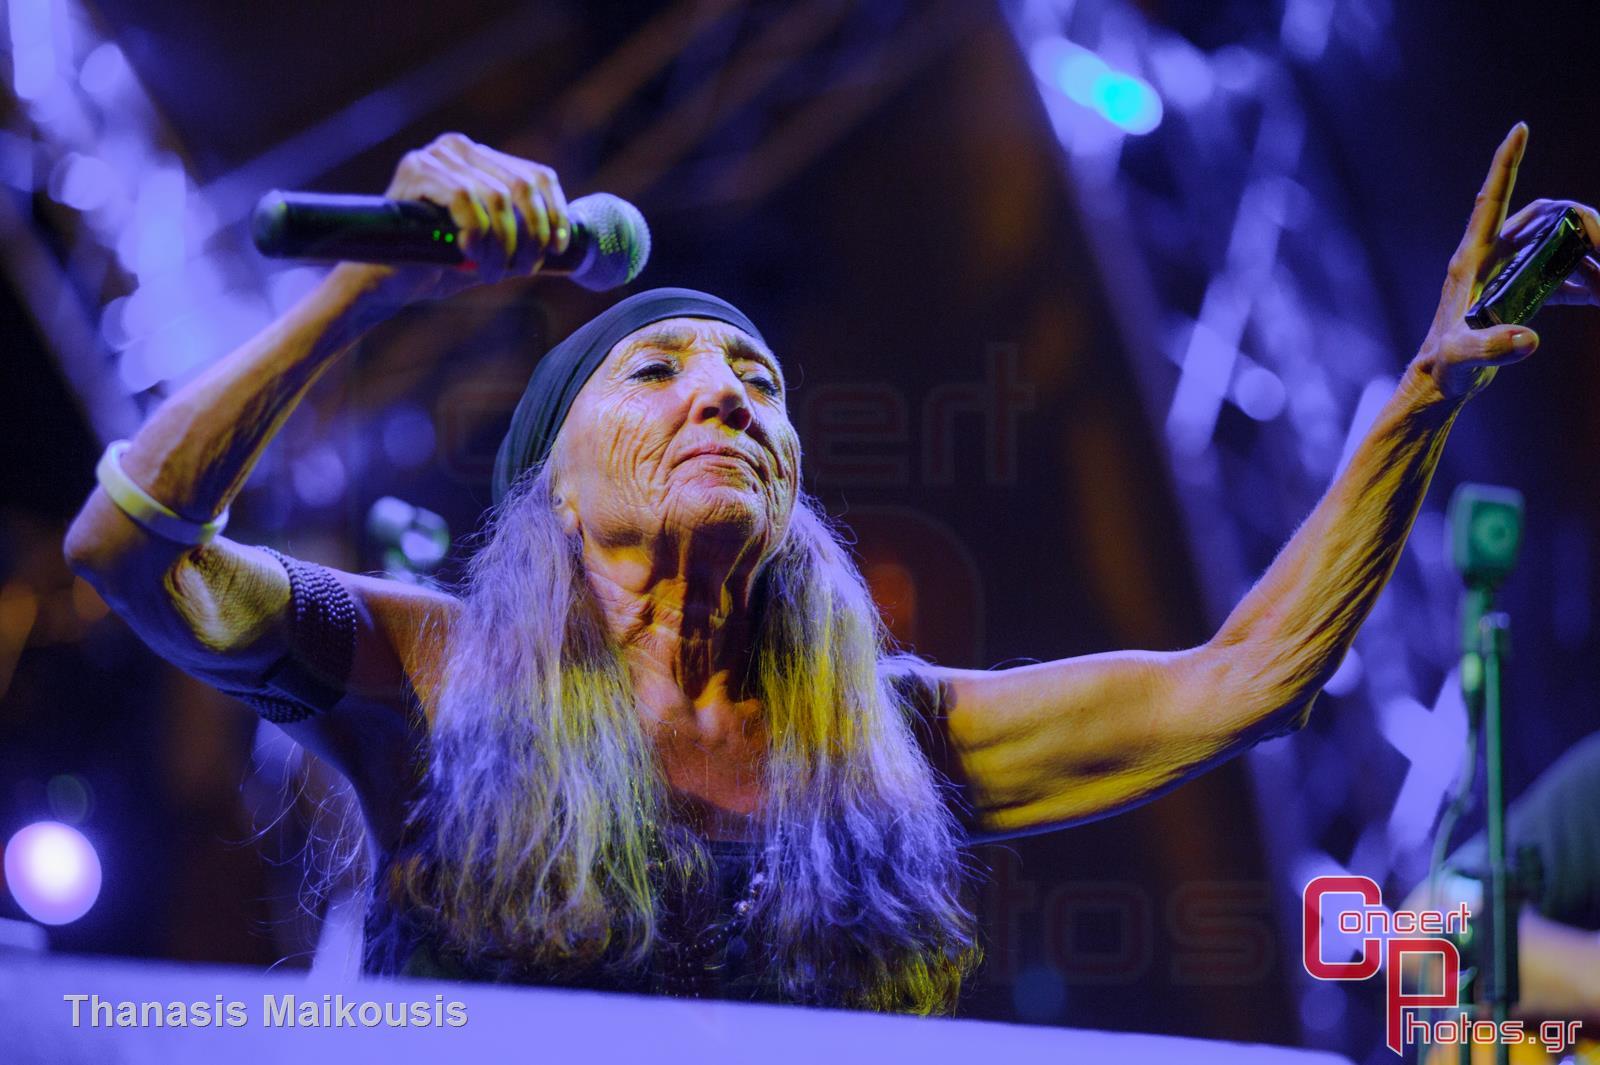 Active Member - Τραγούδα μας να φύγει το σκοτάδι- photographer: Thanasis Maikousis - concertphotos_-5966